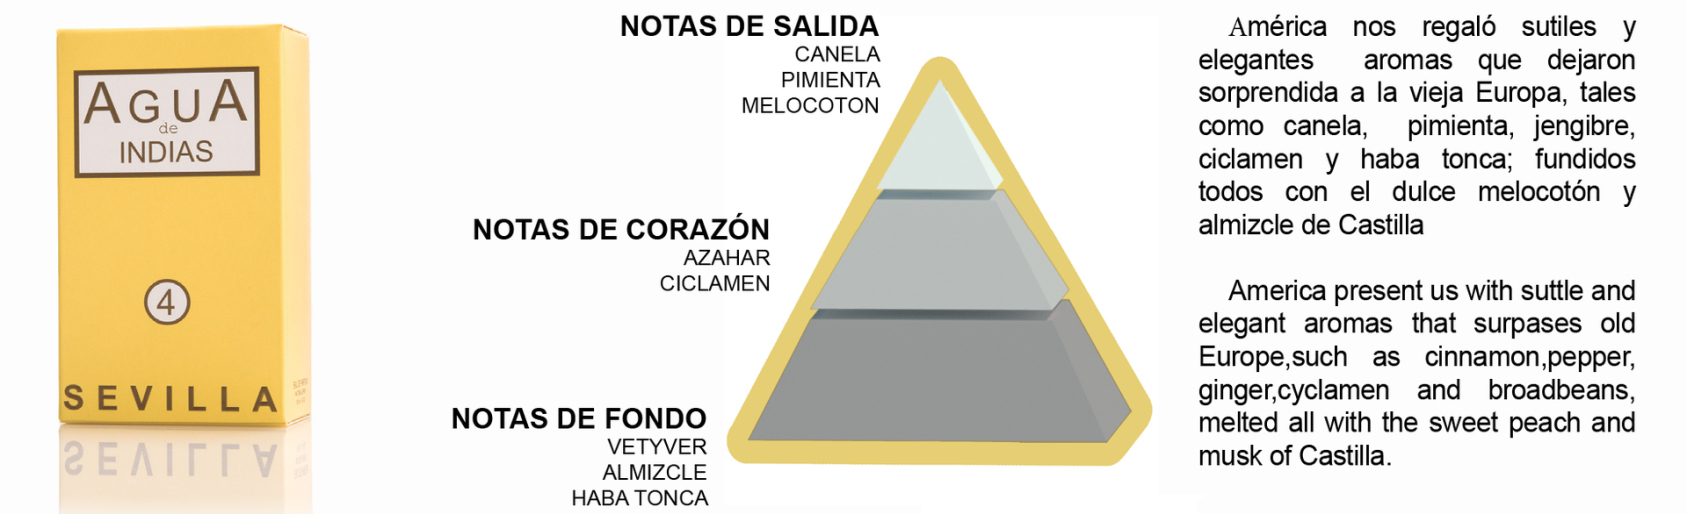 Perfume Agua de Indias 4, Perfume Sevilla, Perfume Córdoba, Perfumes de autor.